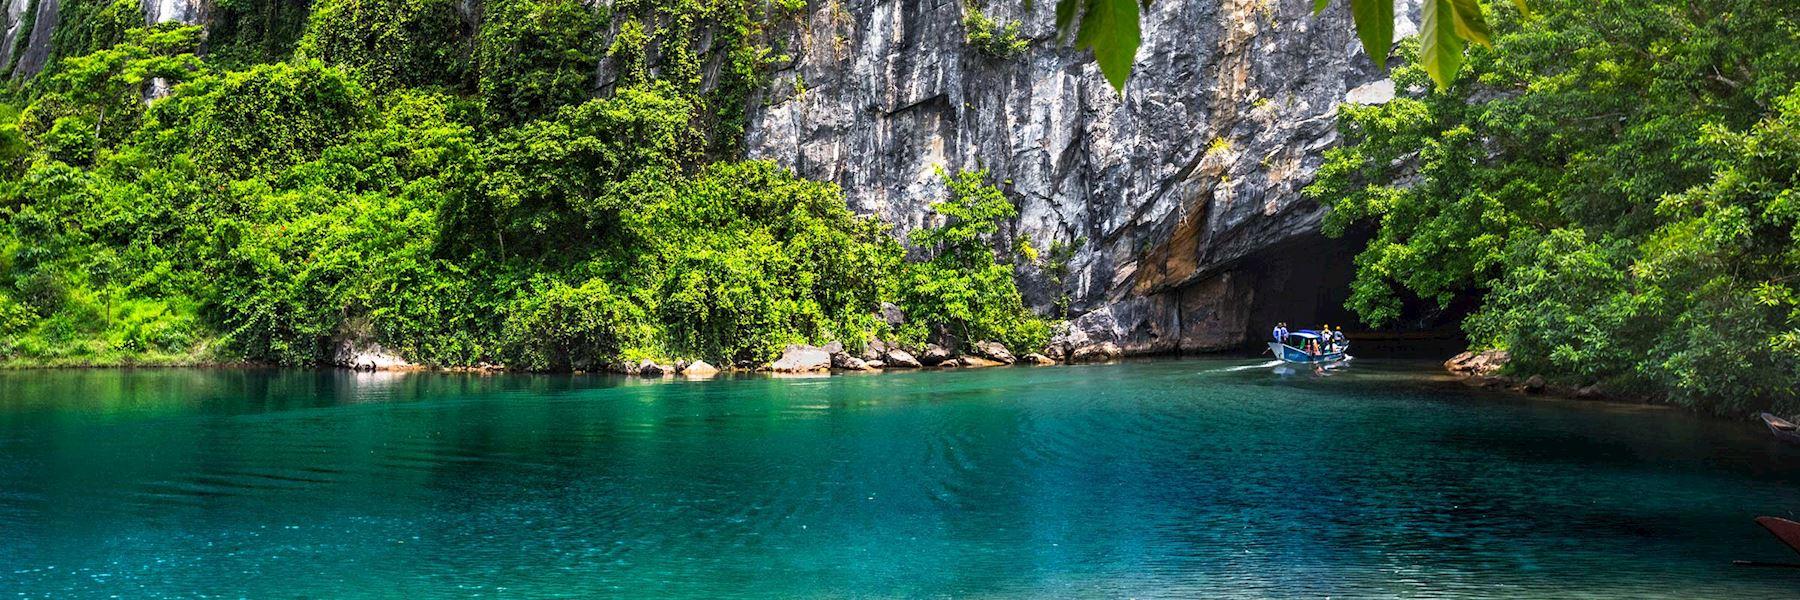 Visit Phong Nha Ke Bang National Park, Vietnam